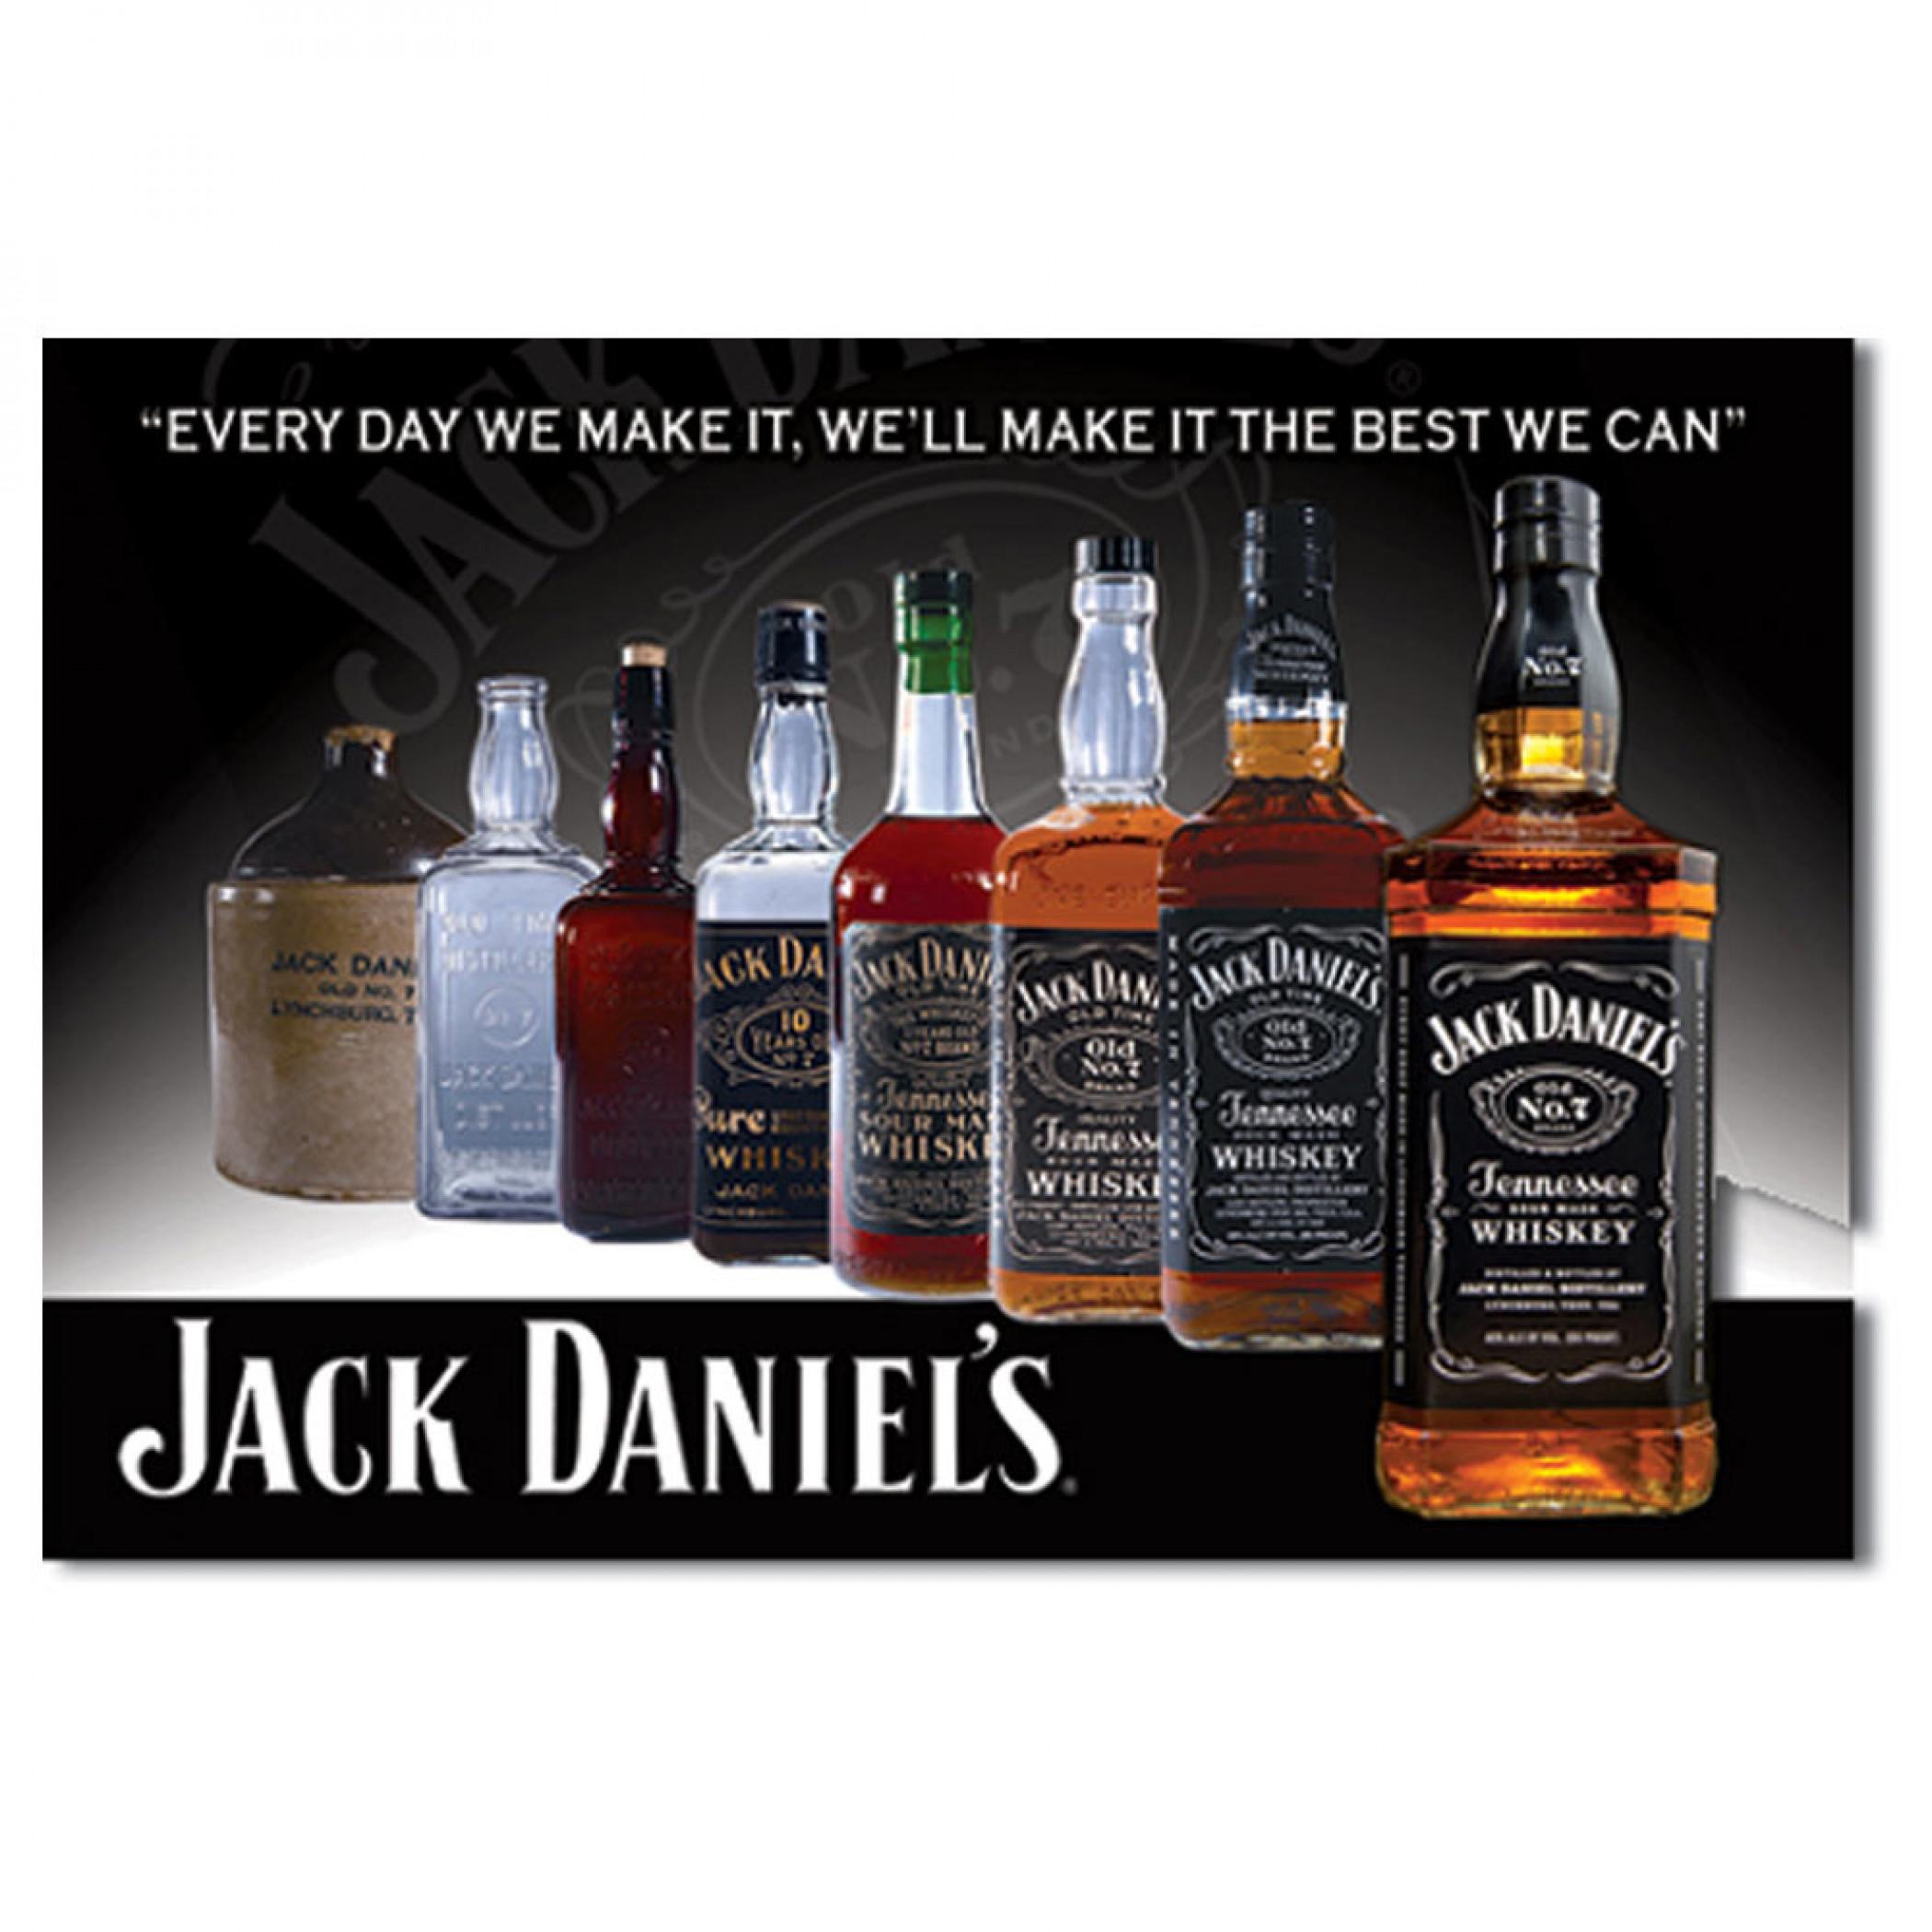 Jack Daniels Bottles 2x3 Magnet